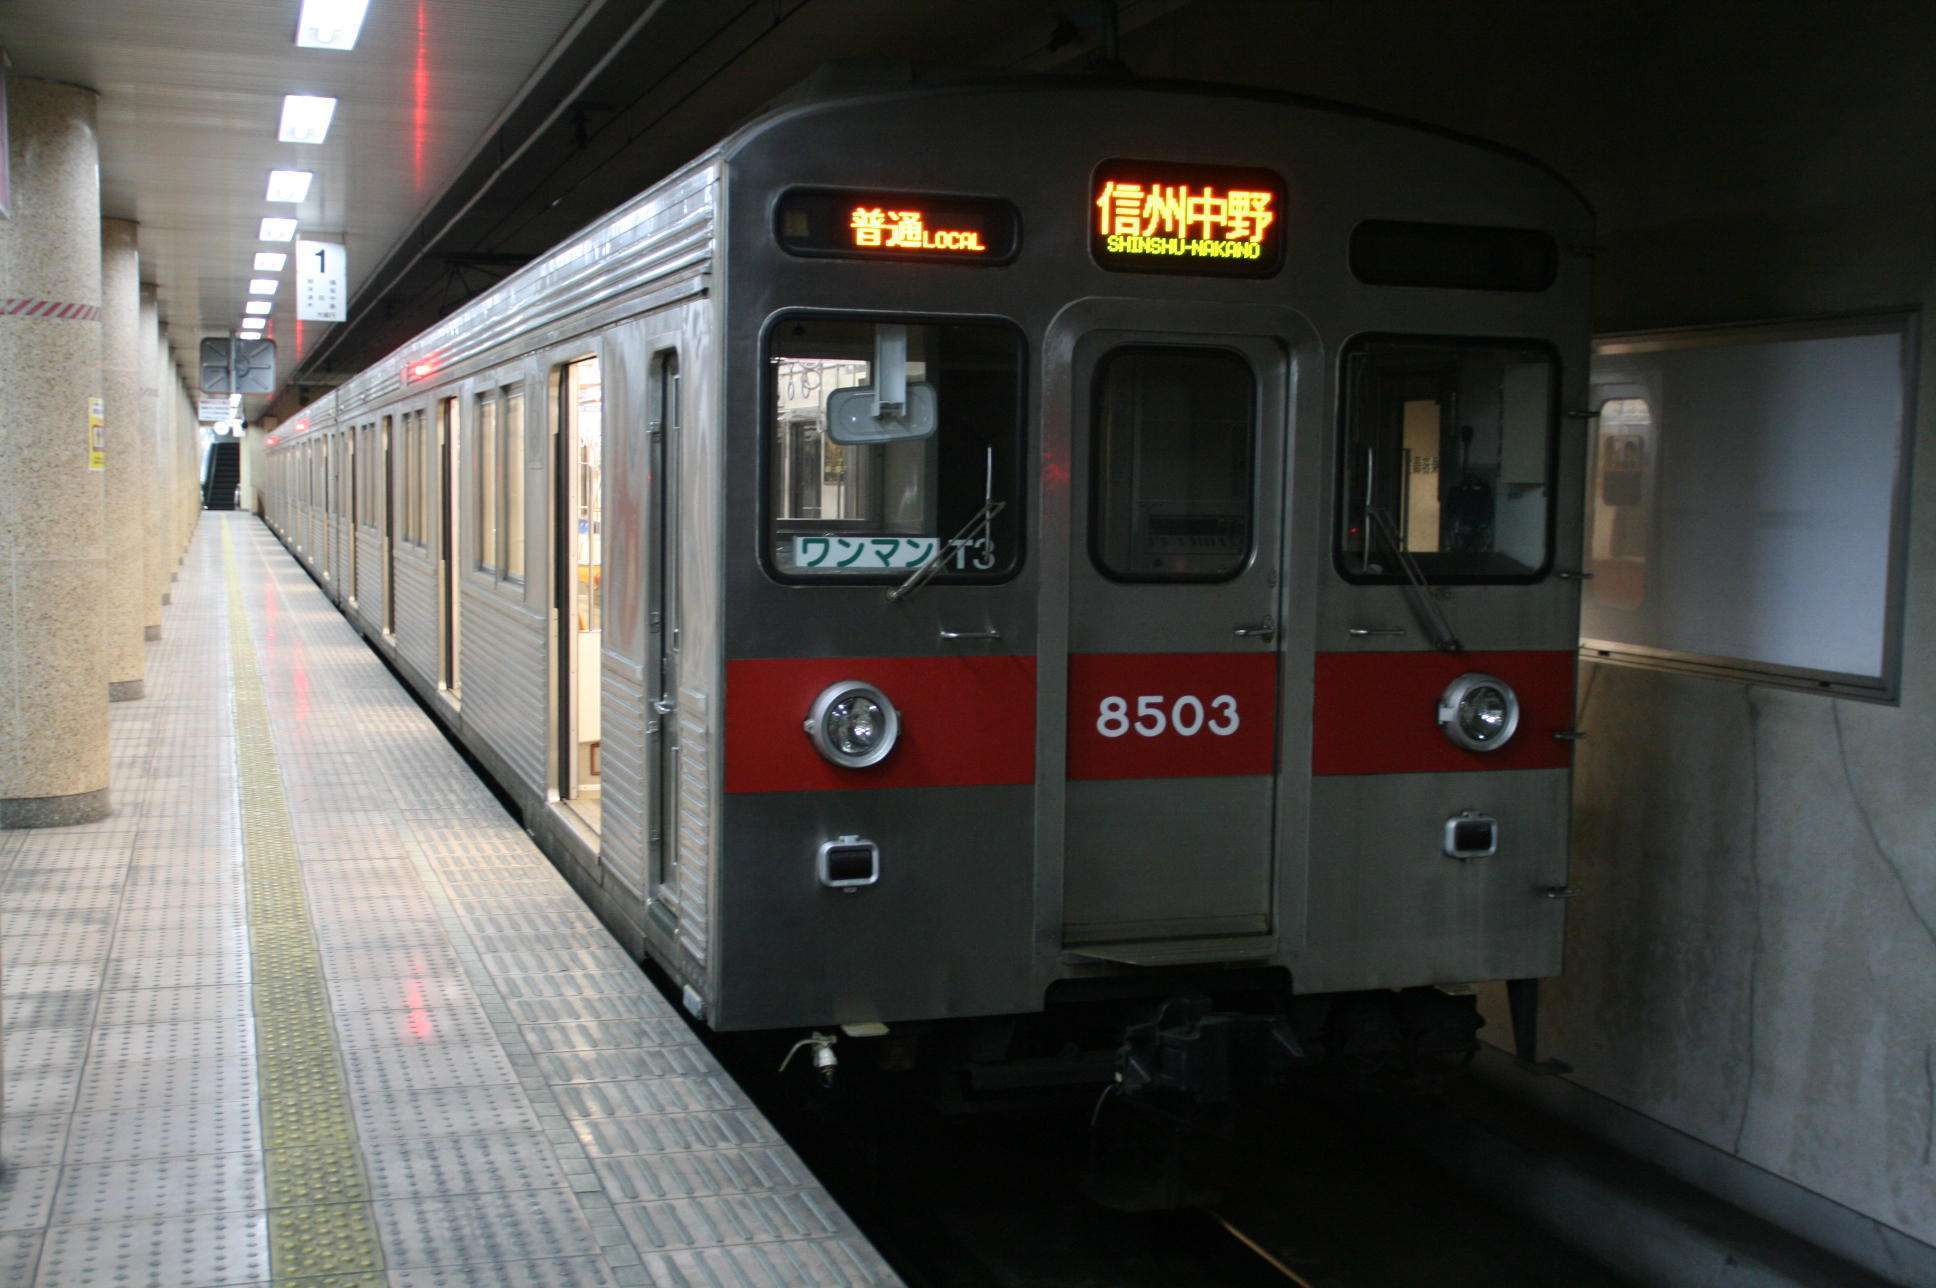 KRL seri 8503 rangkaian 8503F milik Nagano Dentetsu (Nagaden)   Sumber: http://tomodachiya0221.at.webry.info